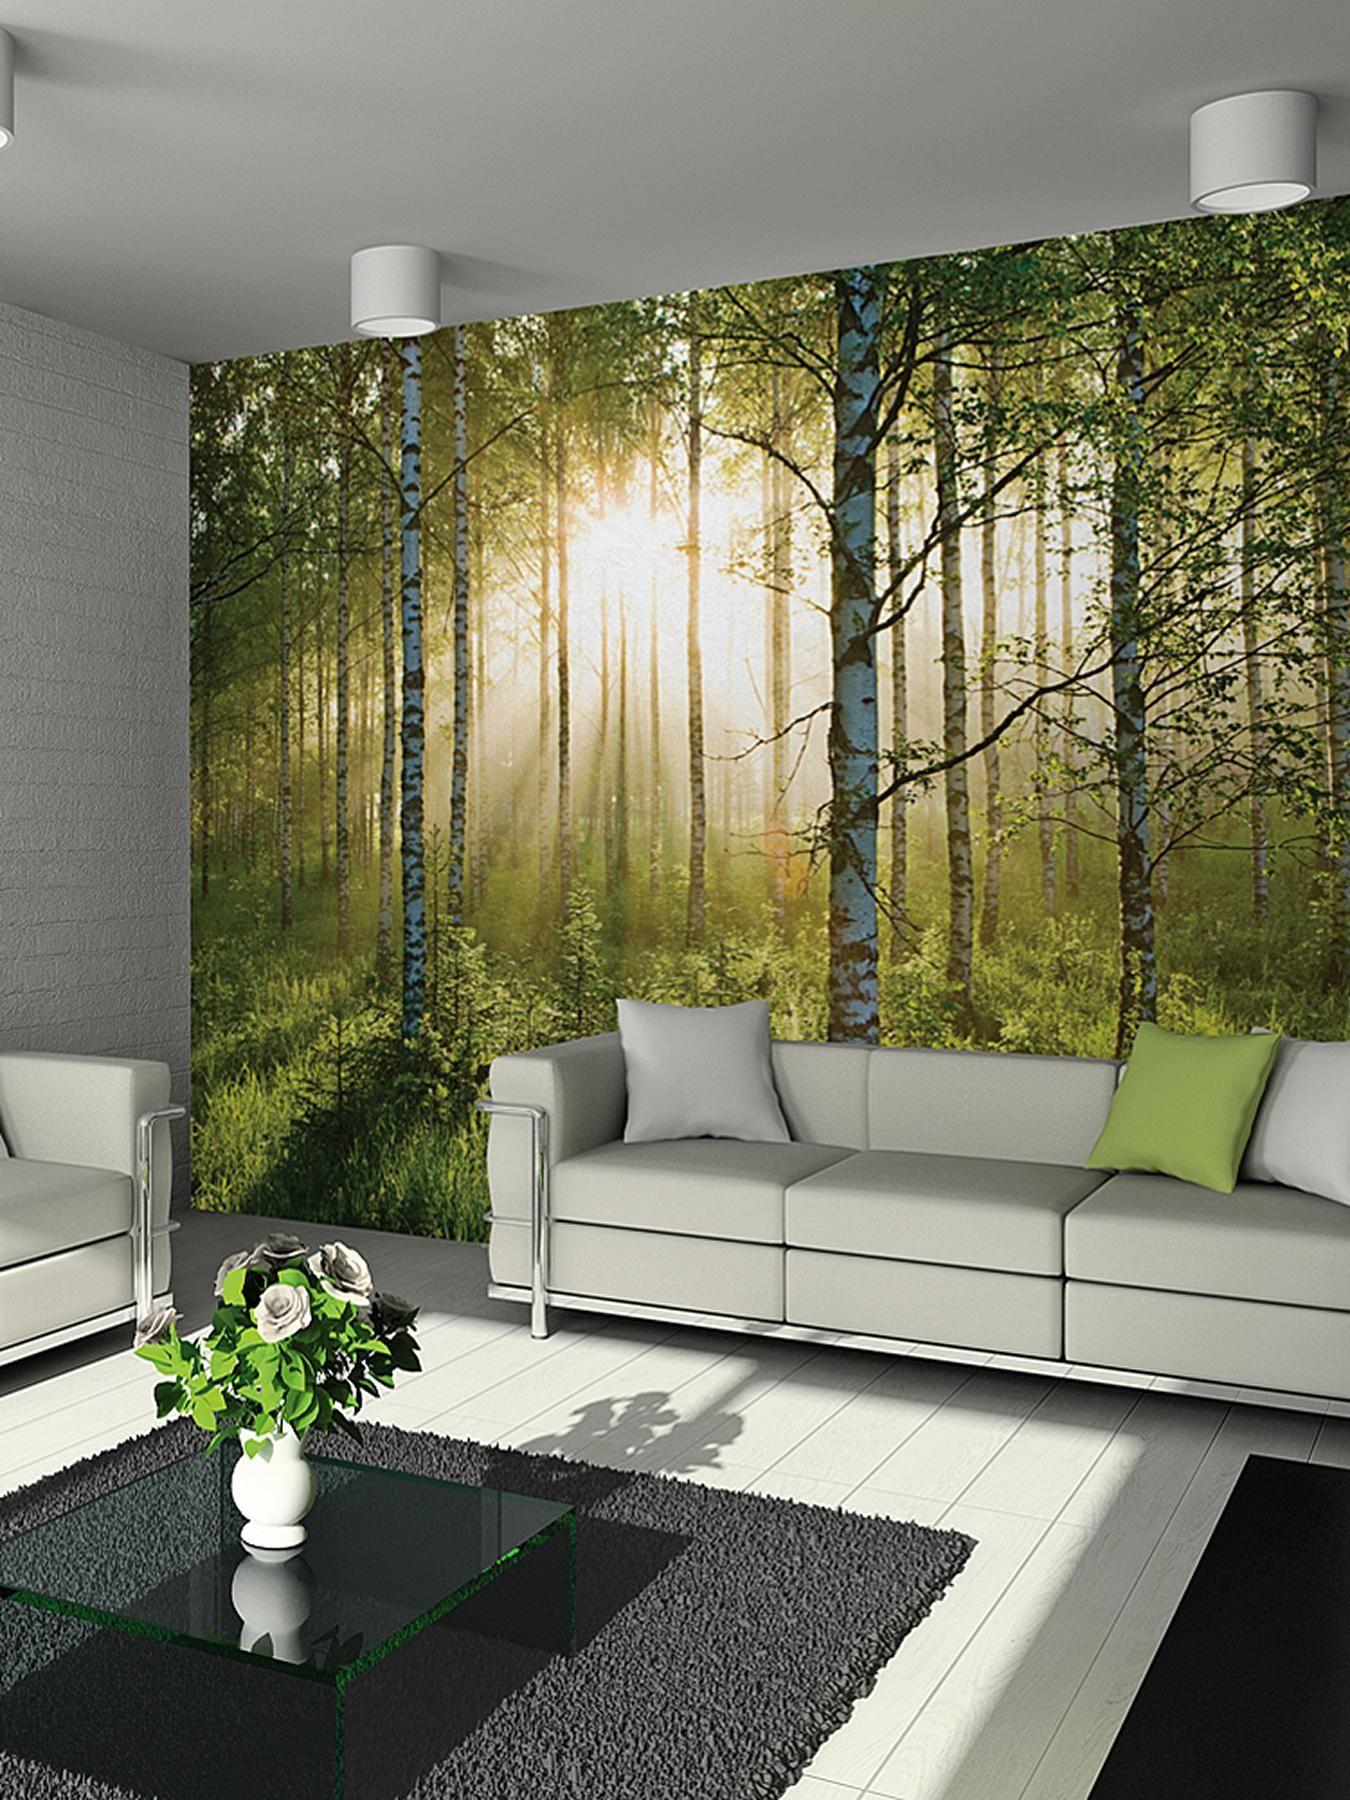 littlewoods ireland online shopping fashion \u0026 homeware paintforest scene wall mural